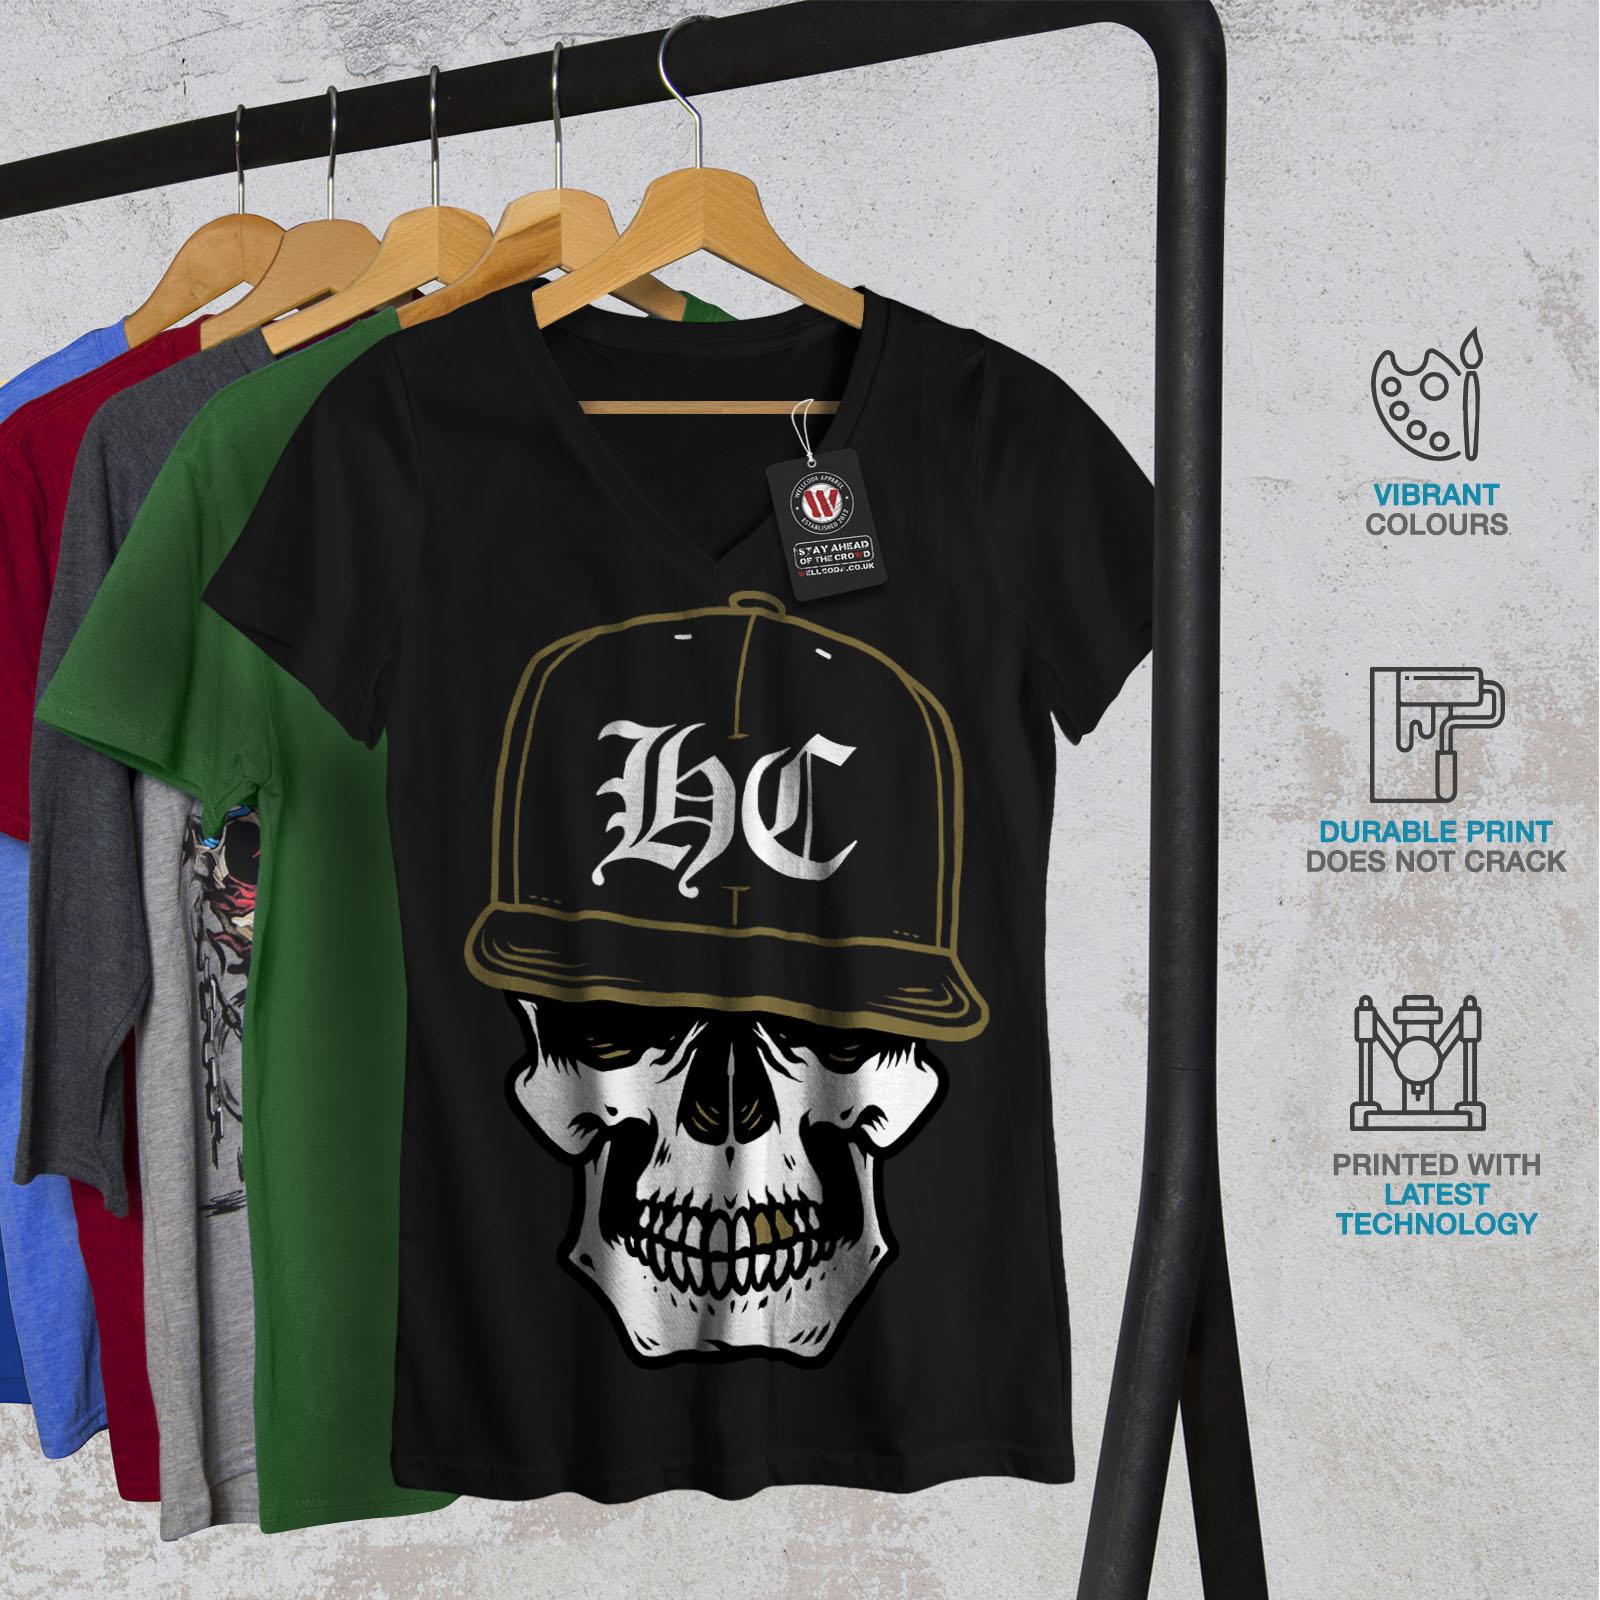 miniature 4 - Wellcoda Skull Swag Gamer Womens V-Neck T-shirt, Rapper Graphic Design Tee